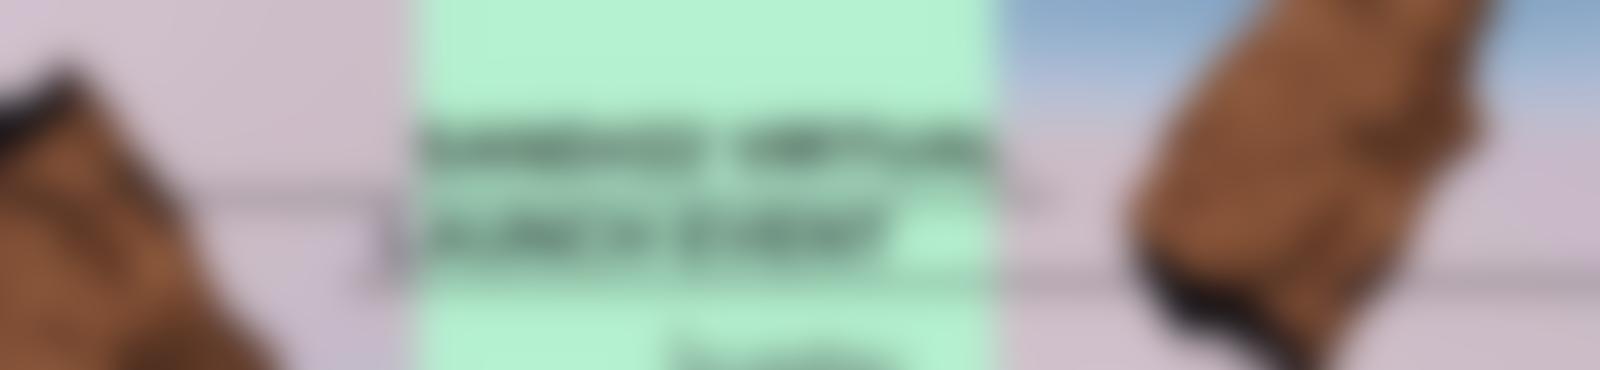 Blurred c423e3f7 eb3b 4147 9bb8 005f4afb78c0